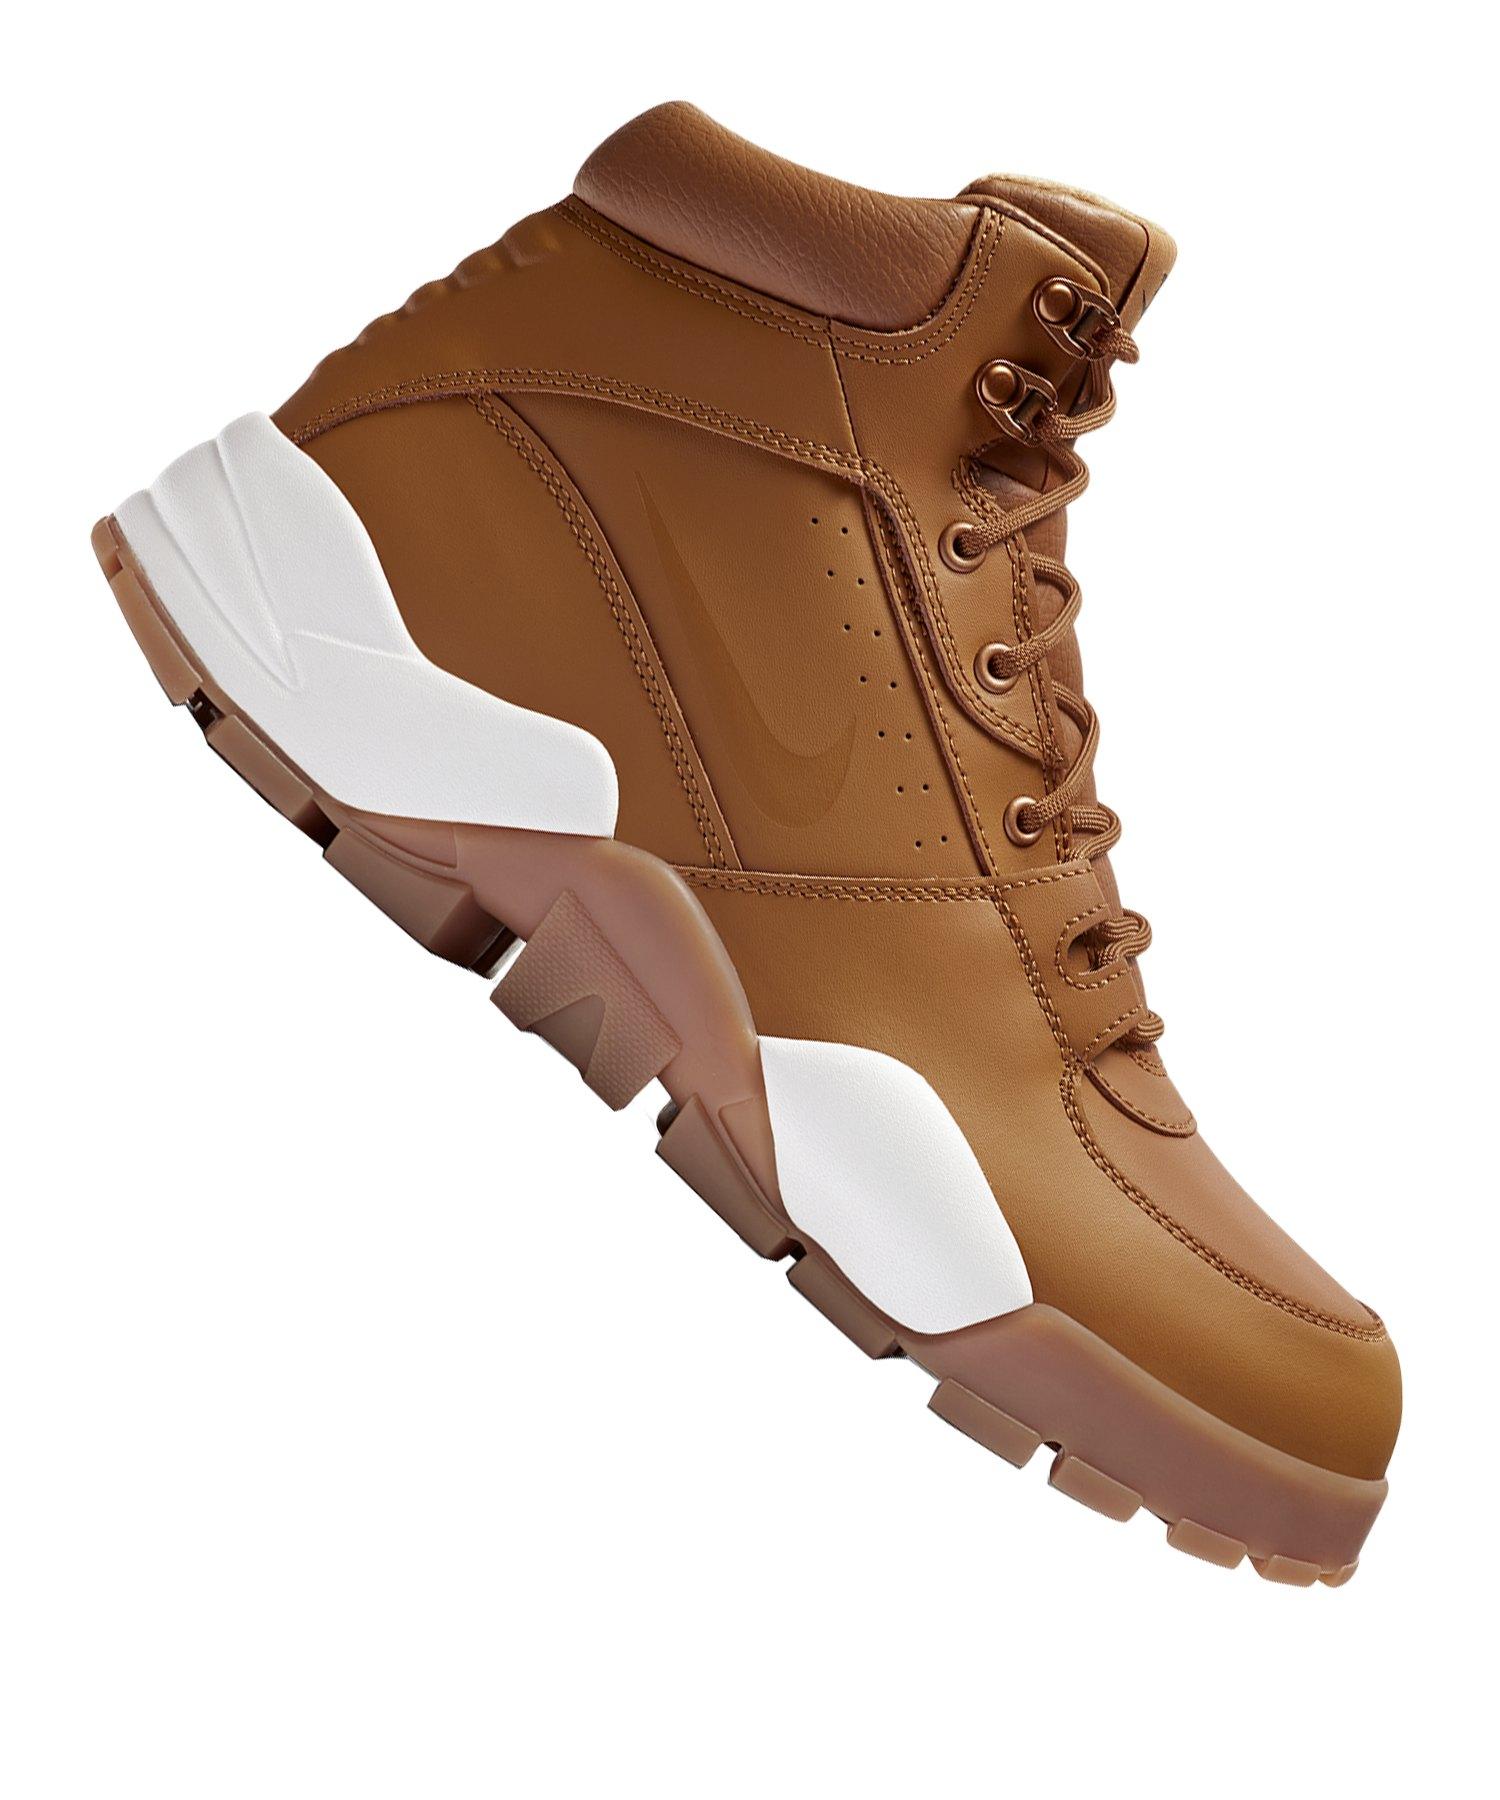 Nike Rhyodomo Leather Winterstiefel F700